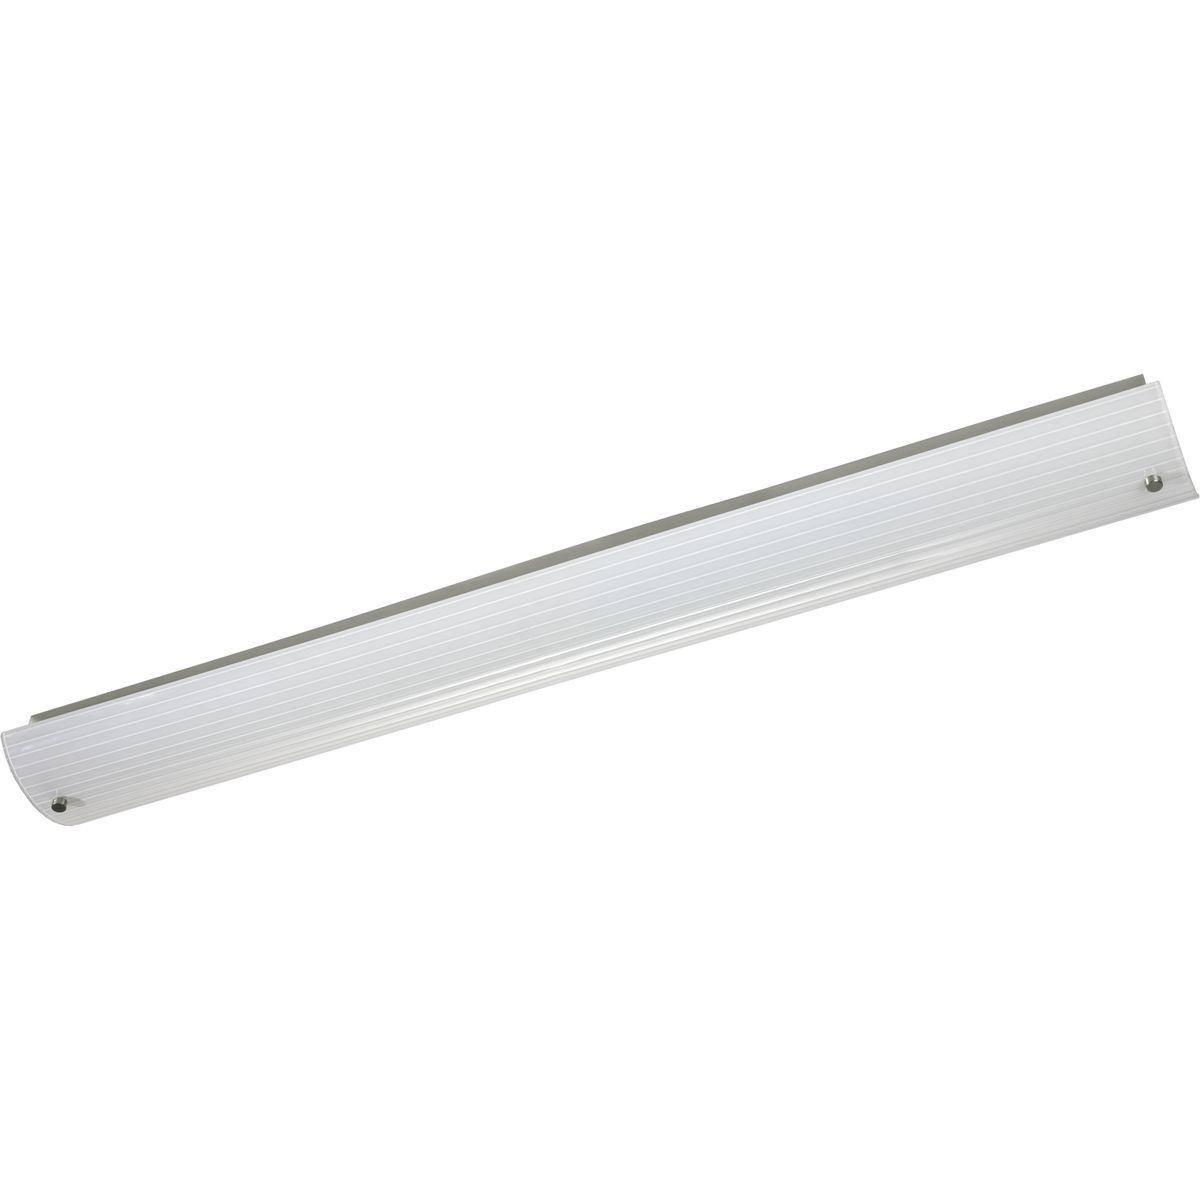 P7221-09EB Progress Lighting Two-Light Linear Fluorescent Bath